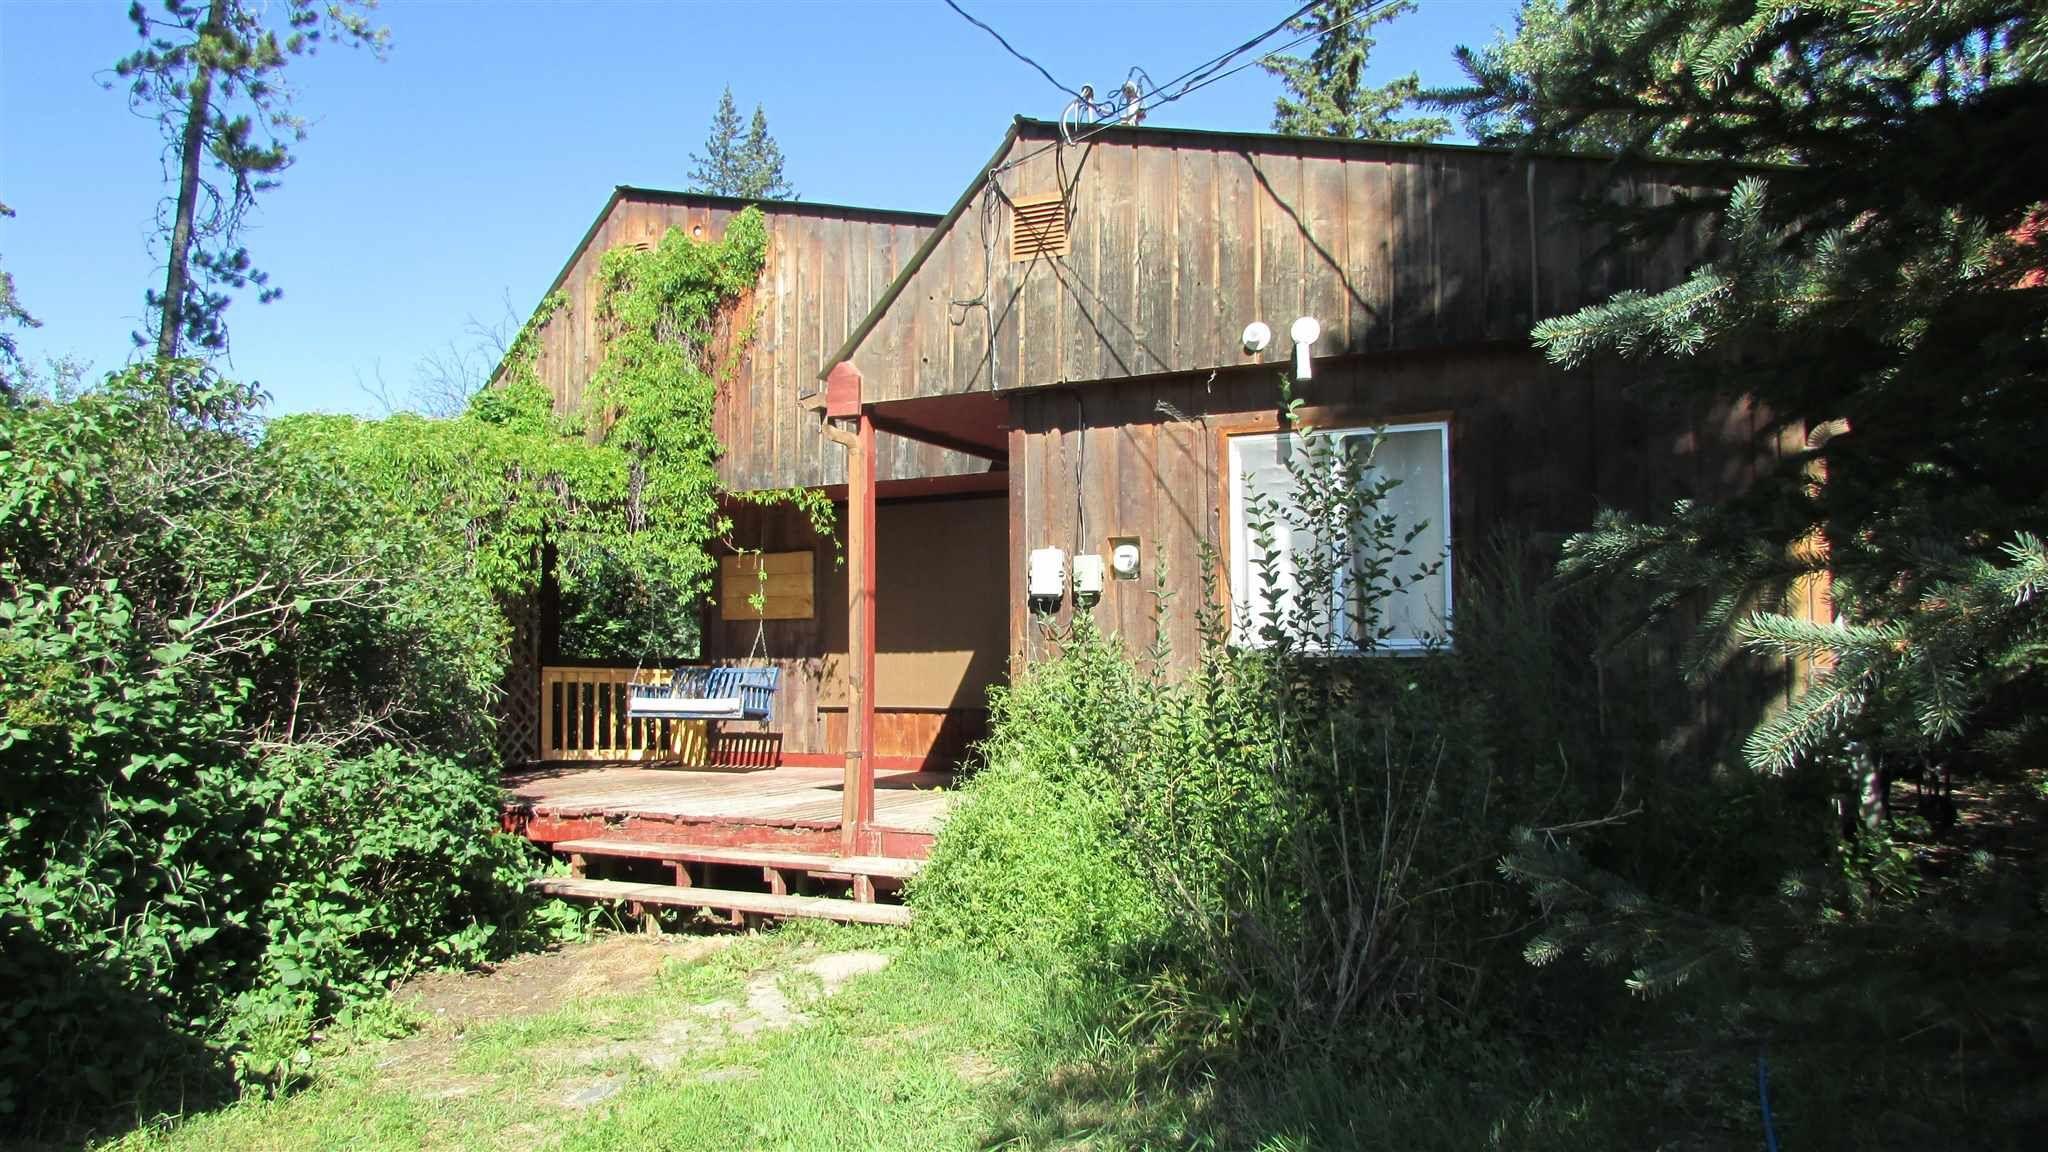 Main Photo: 12308 BEATON Street: Hudsons Hope House for sale (Fort St. John (Zone 60))  : MLS®# R2606455